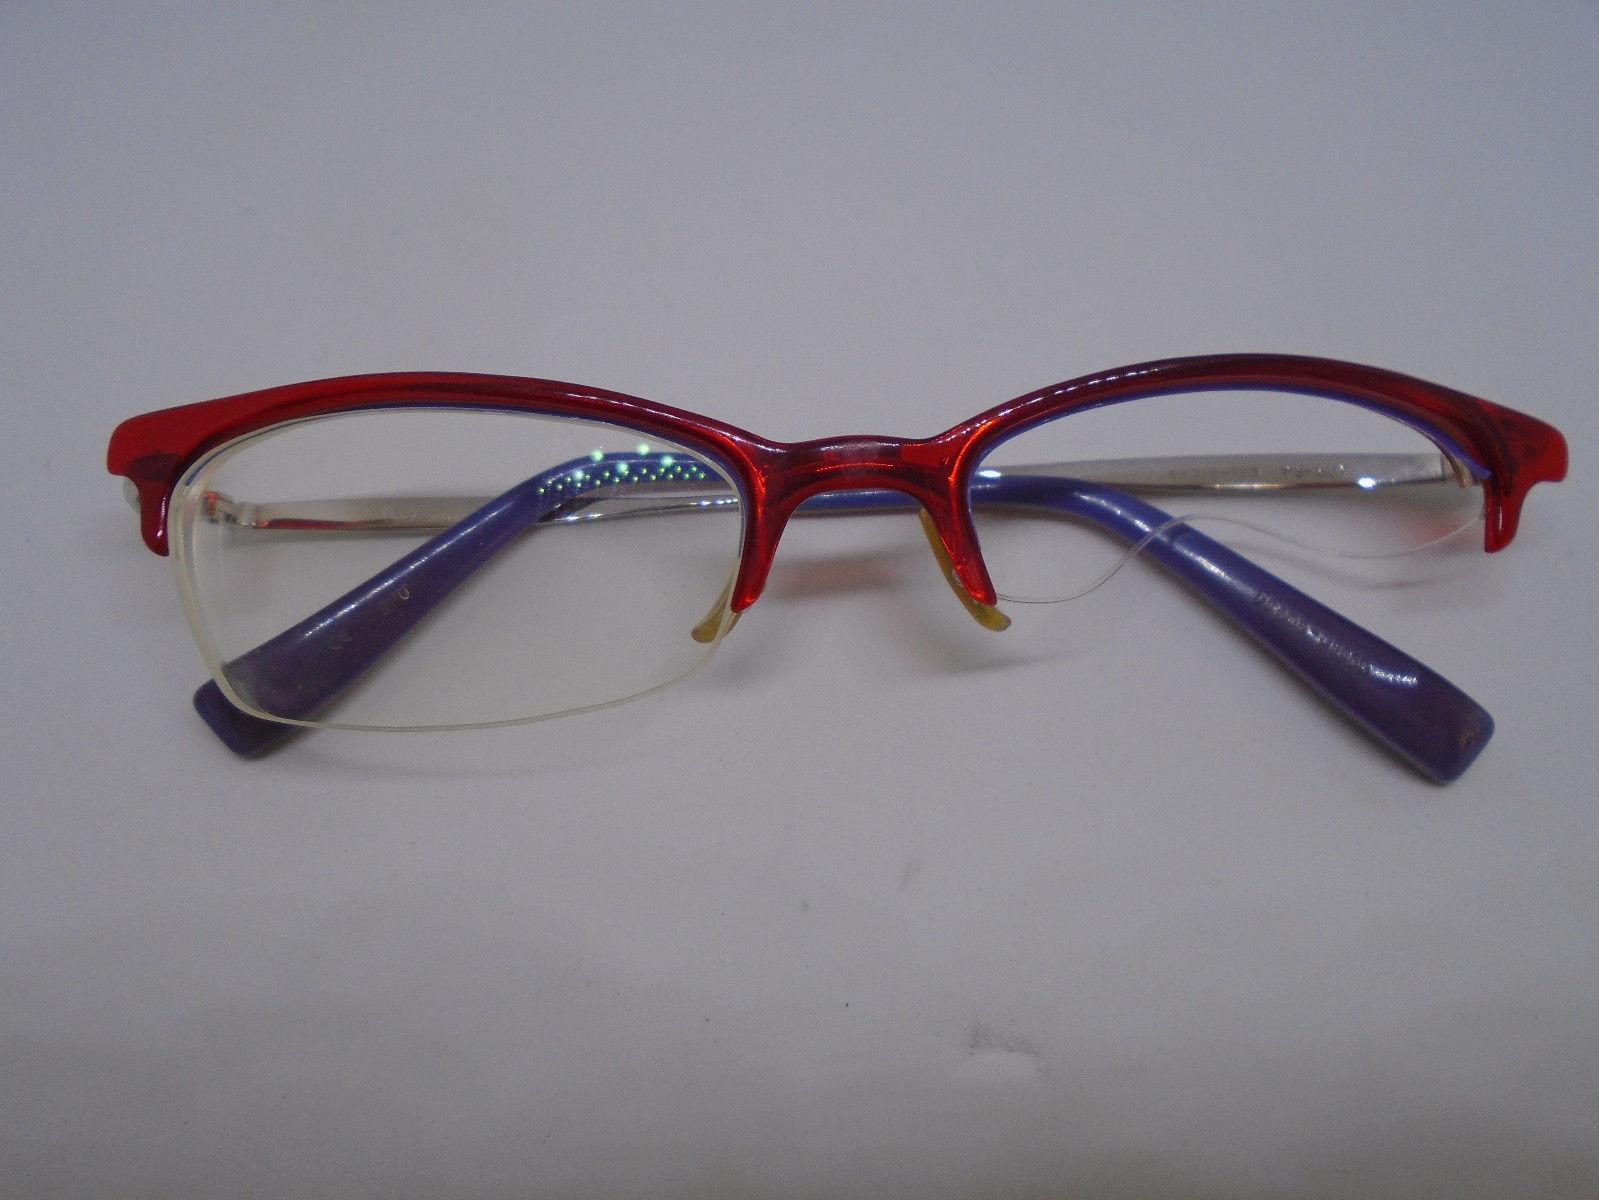 80c7d520f8 Black Horn Plum Source · Paul Smith Eyeglass Frame 29 listings